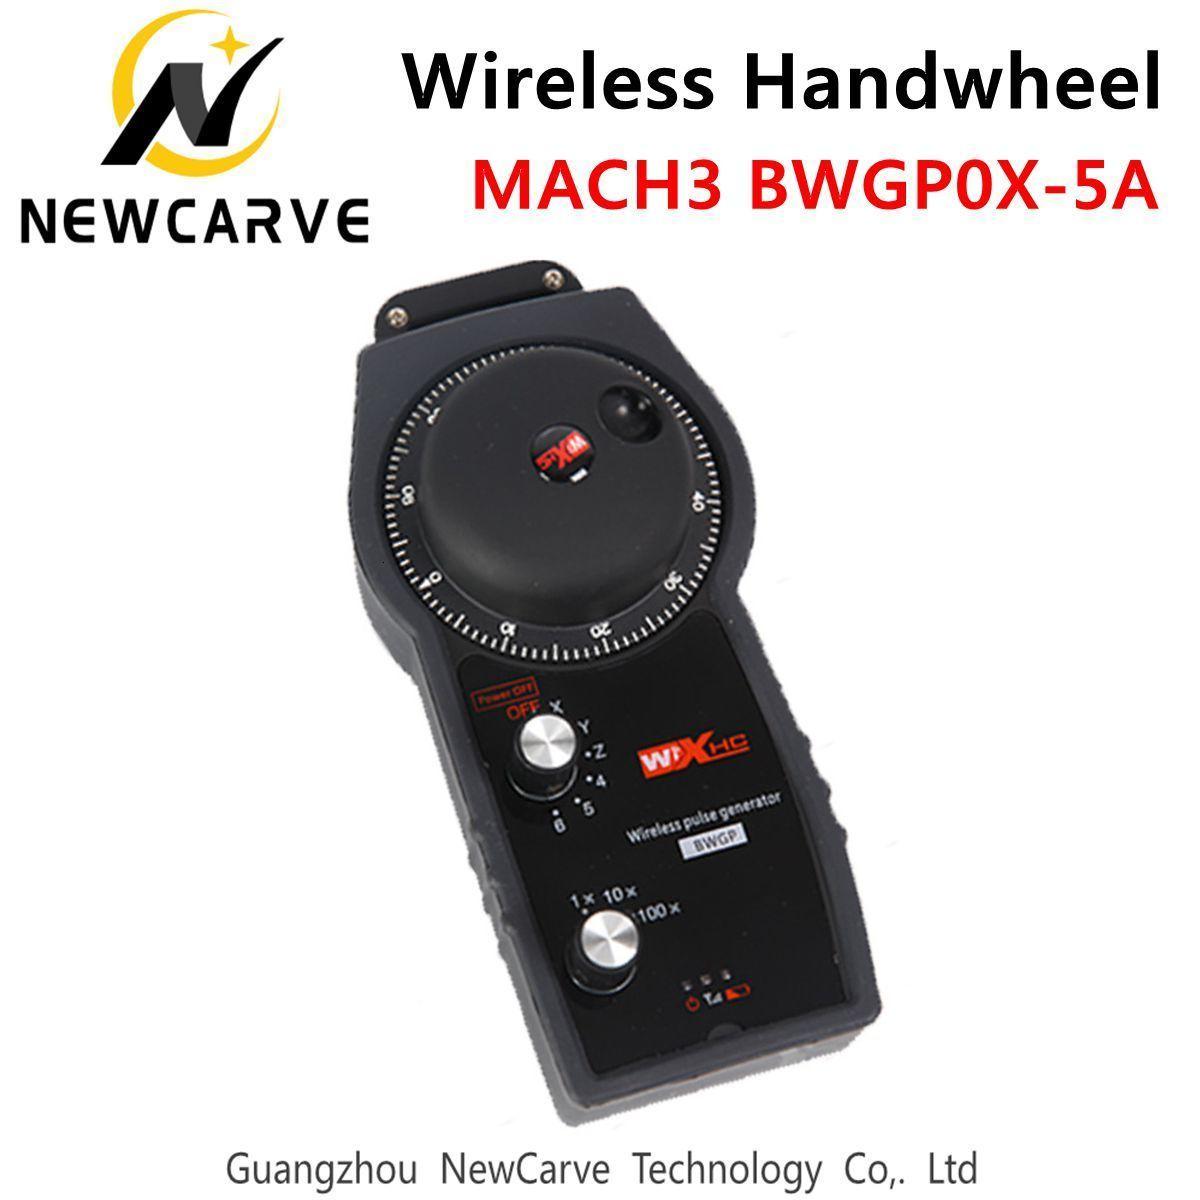 SIEMENS / MITSUBISHI / 신텍 / CNC 핸드 휠 BWGP0X-5A에 대한 GSKCNC MACH3 시스템 제어 무선 컨트롤러